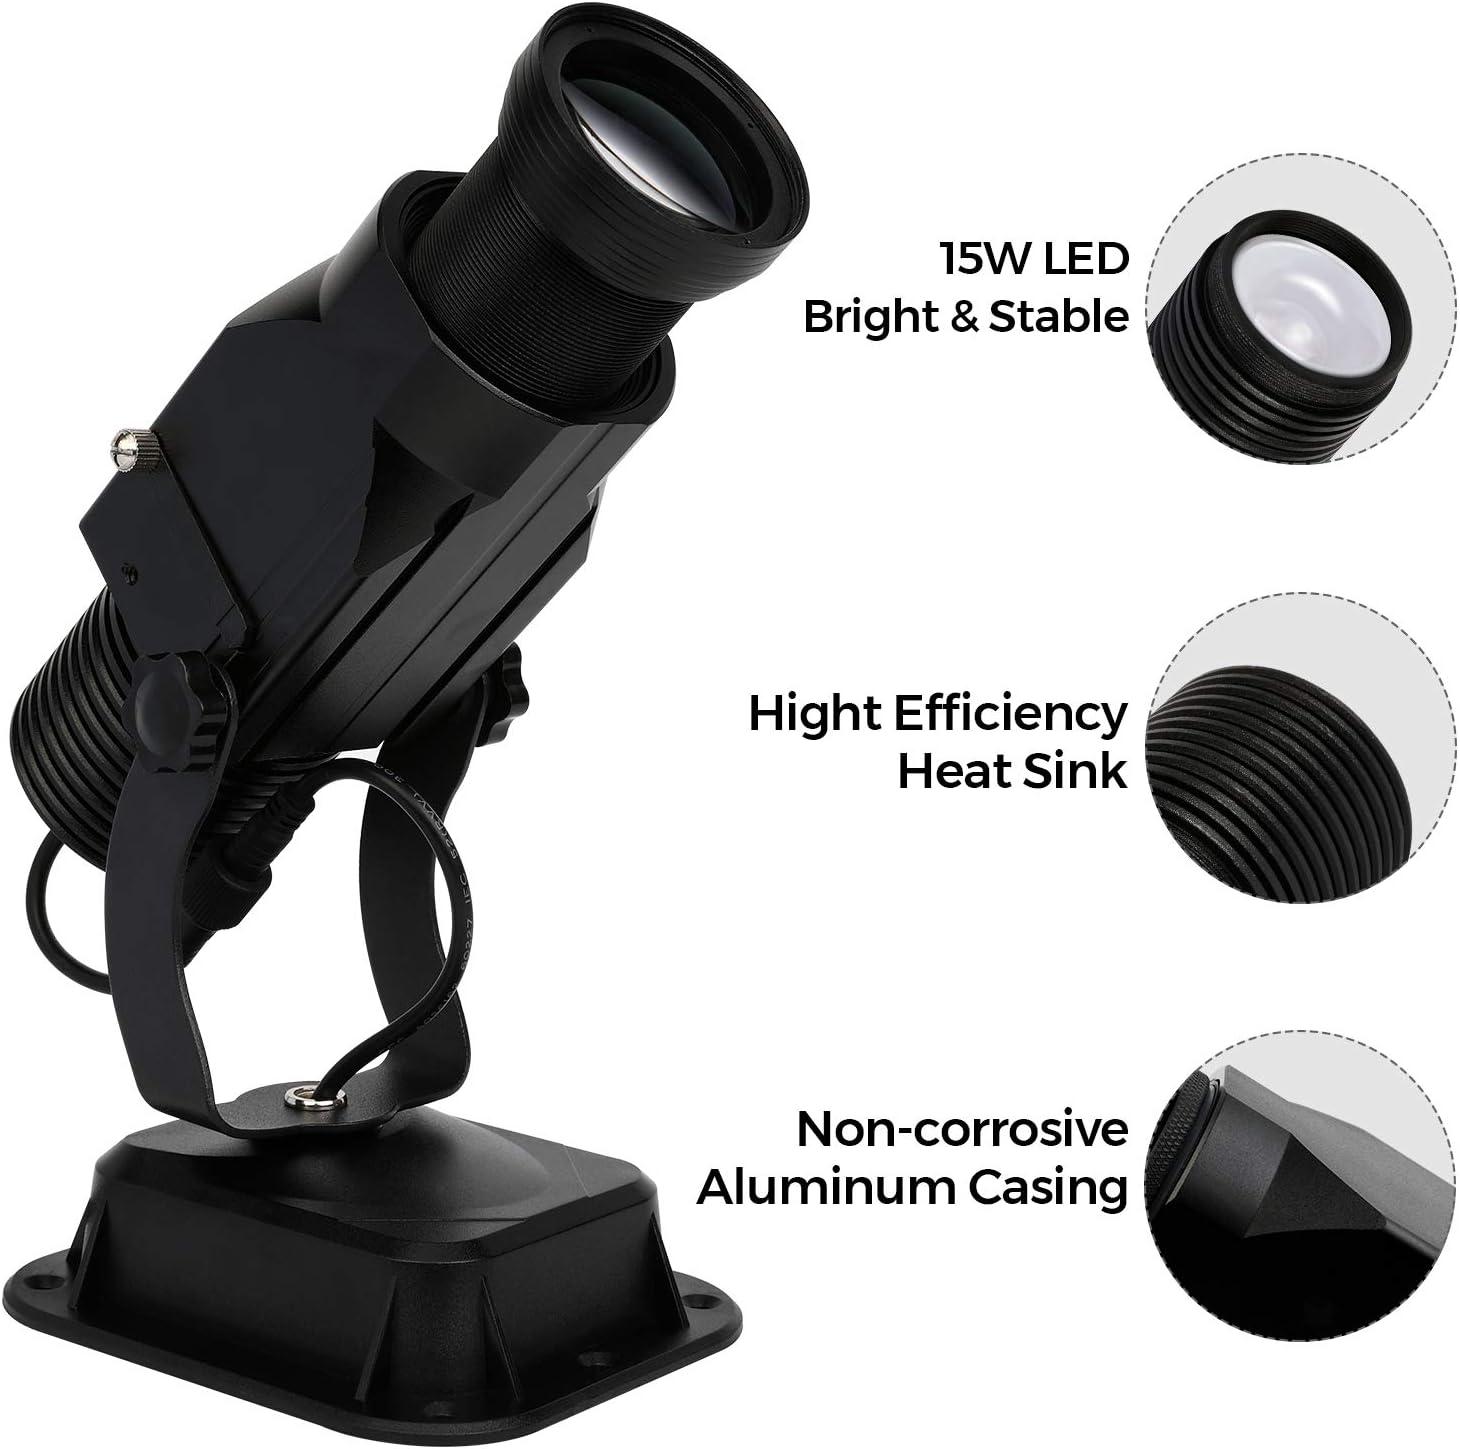 Lighting Equipment & Accessories Live Sound & Stage ghdonat.com ...